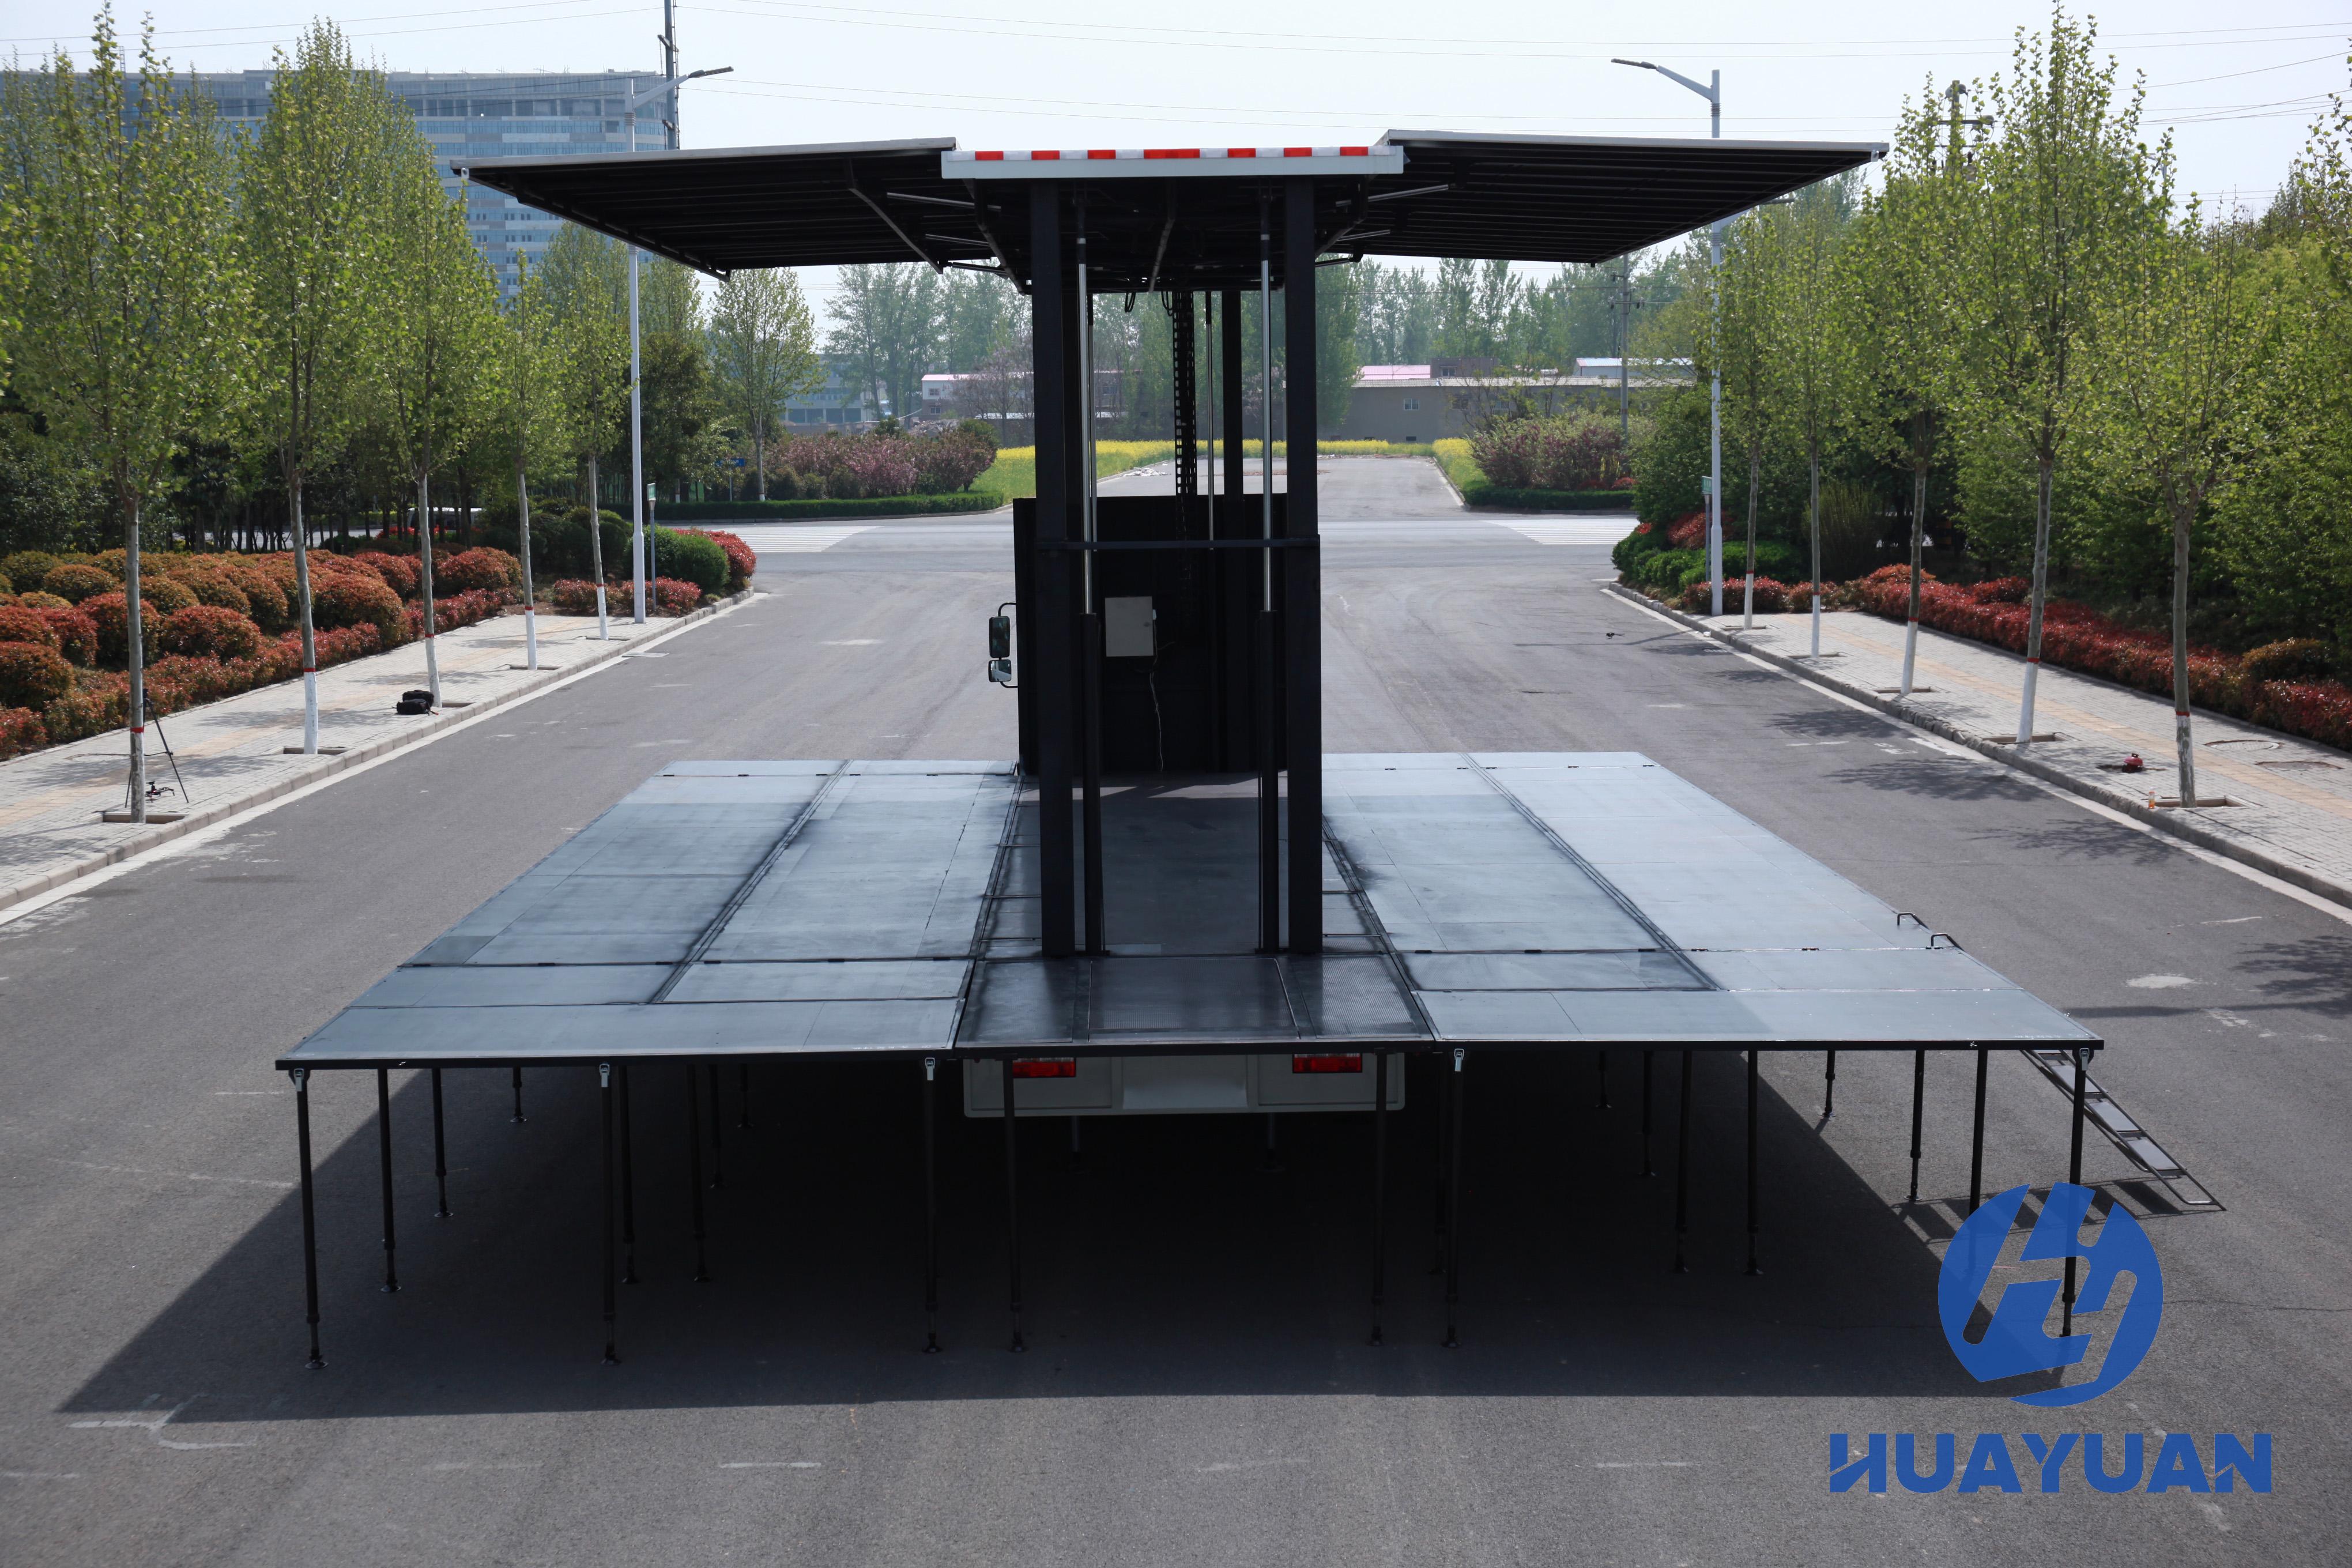 HY-stage-truck 1 (16).JPG